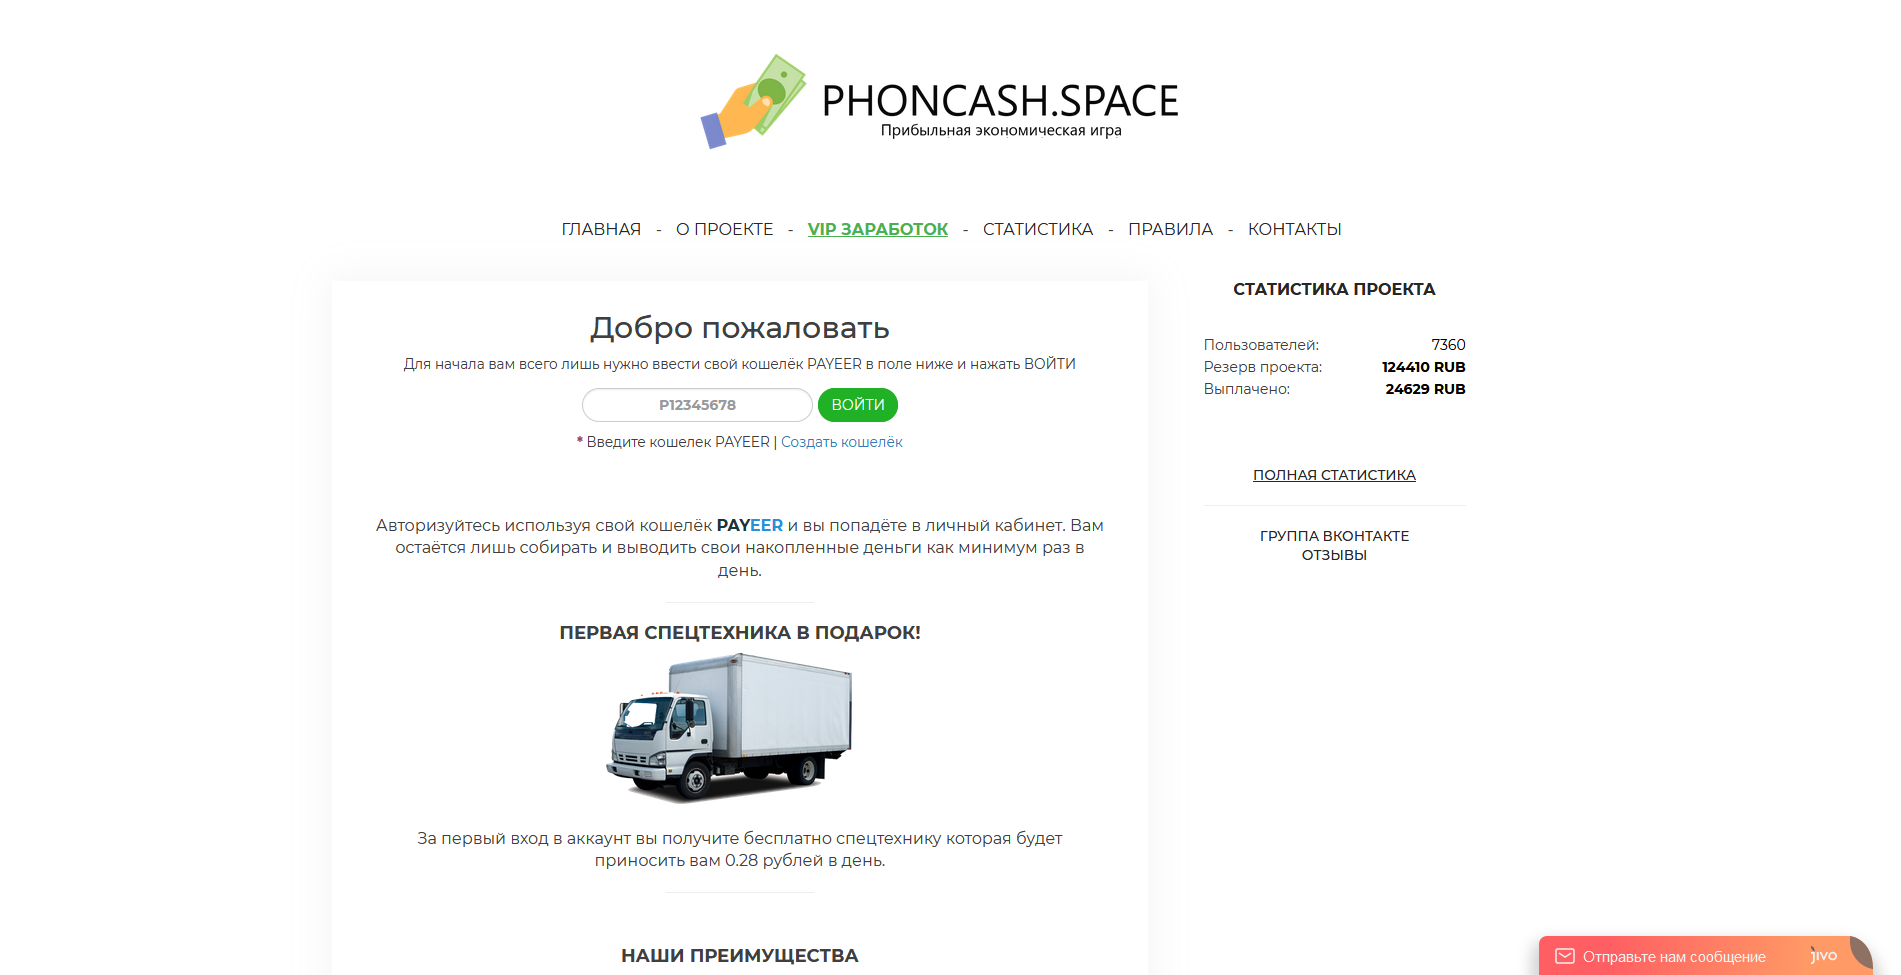 PHONCASH